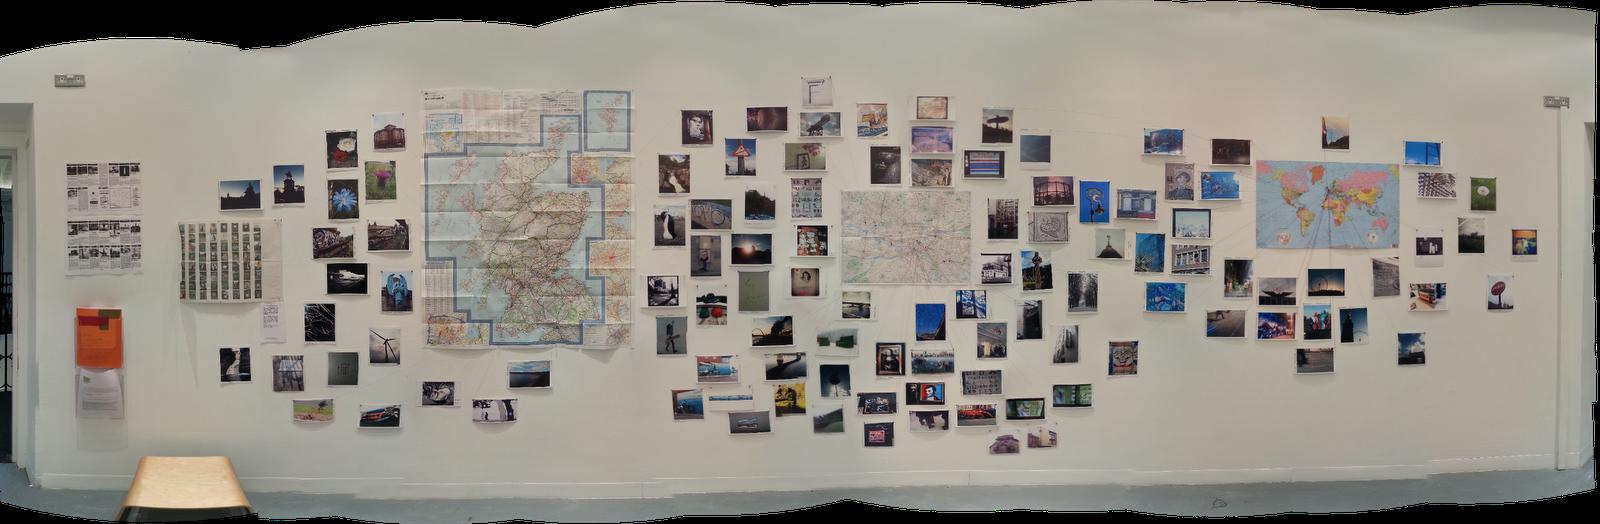 GoMA, Glasgow, #SMWyourpublicart exhibit